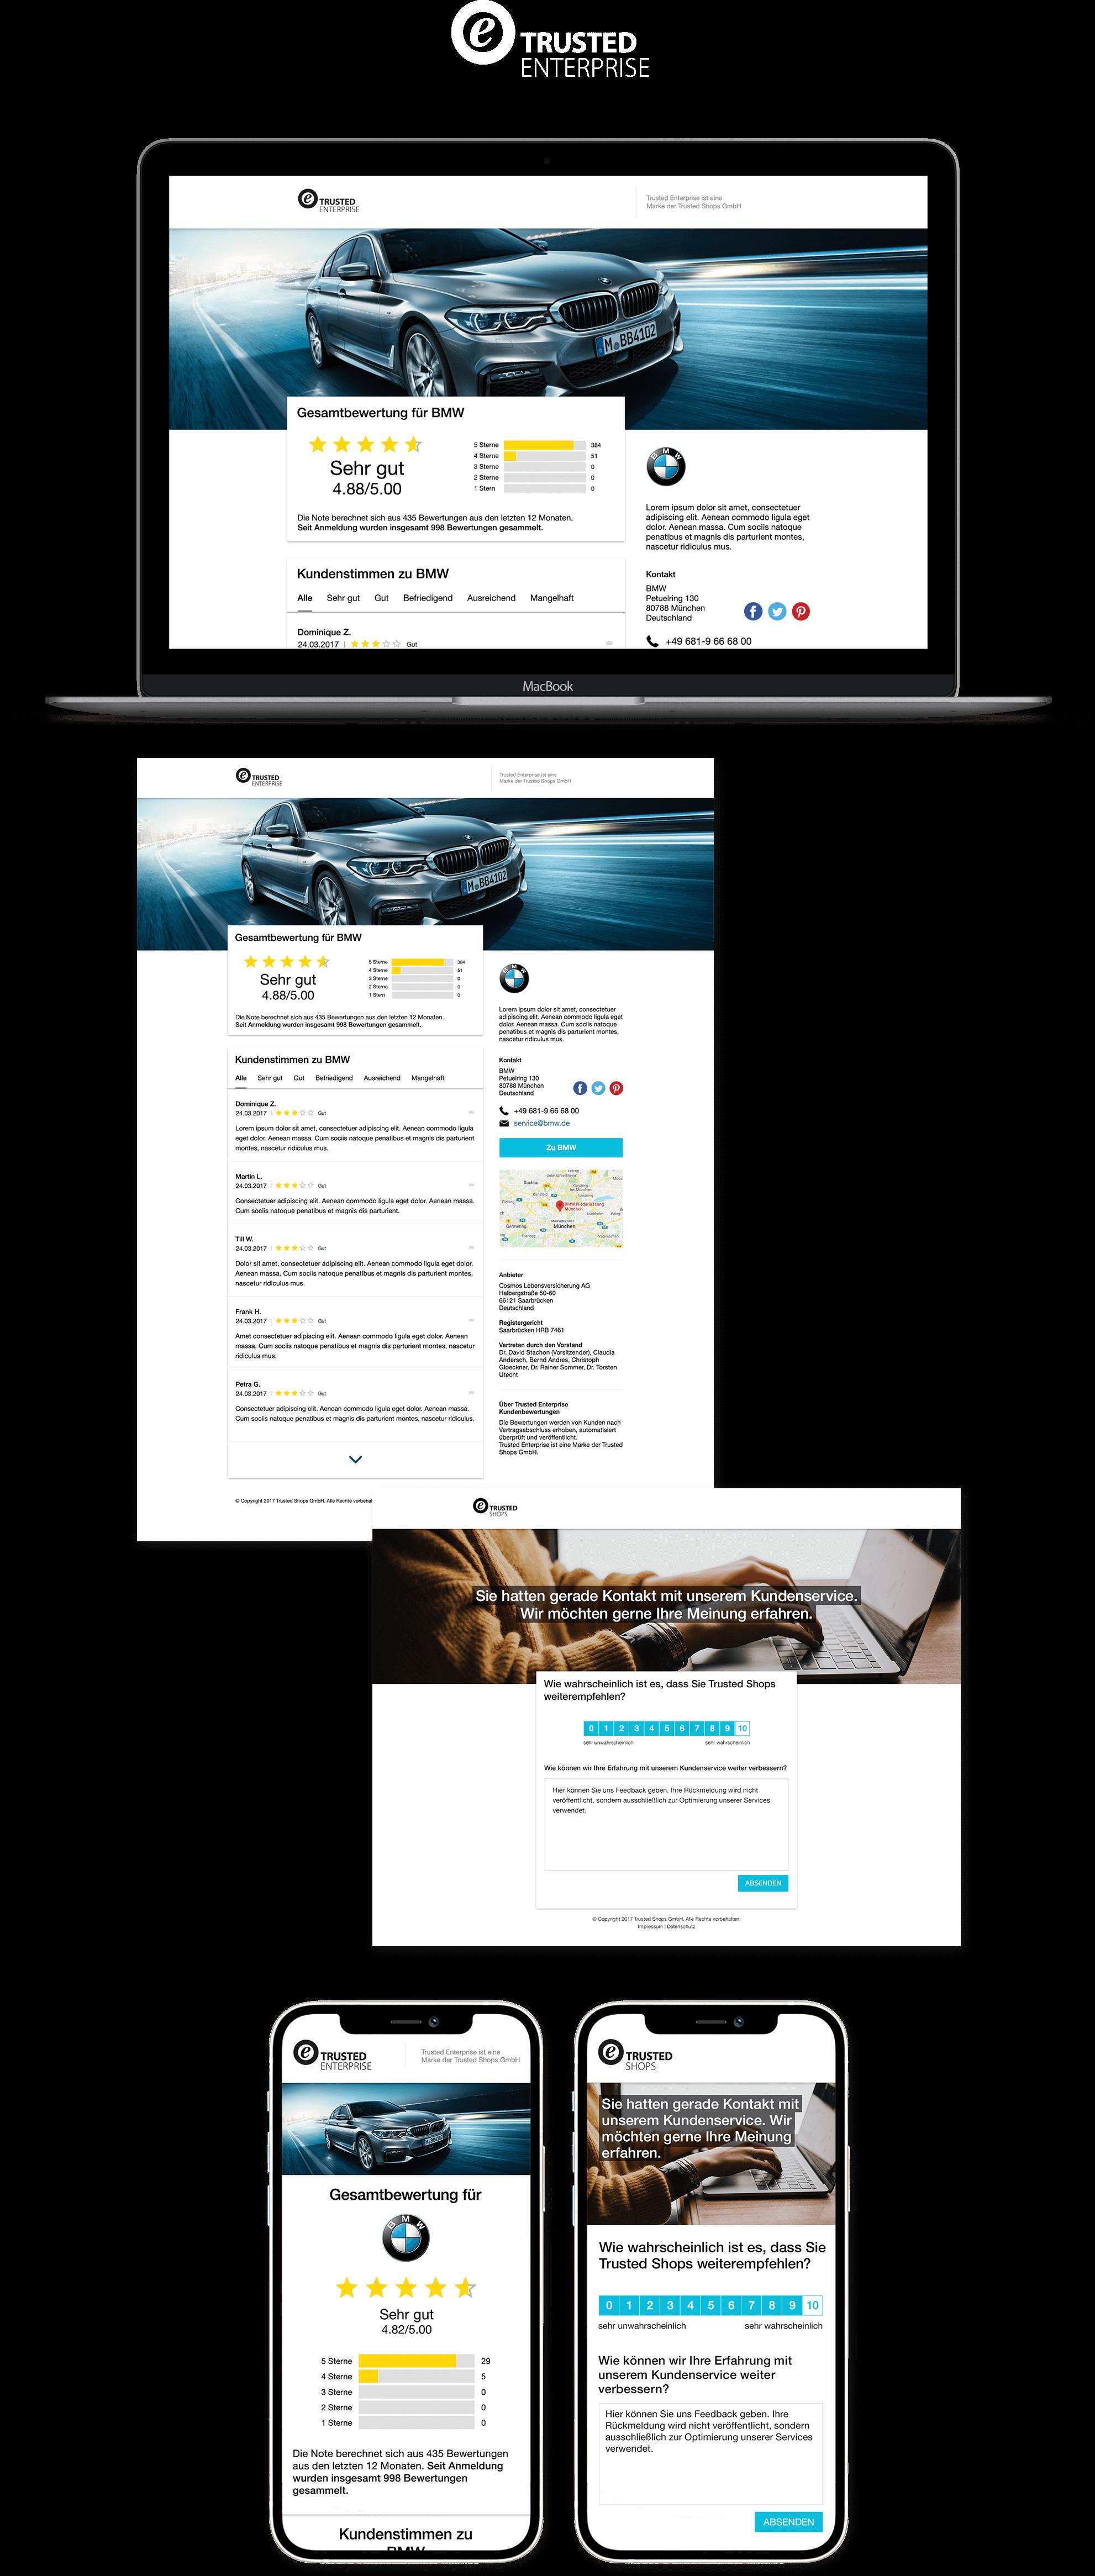 design-screendesign-ux-user-experience-grafik-koeln-thewhiteout-trustedshops